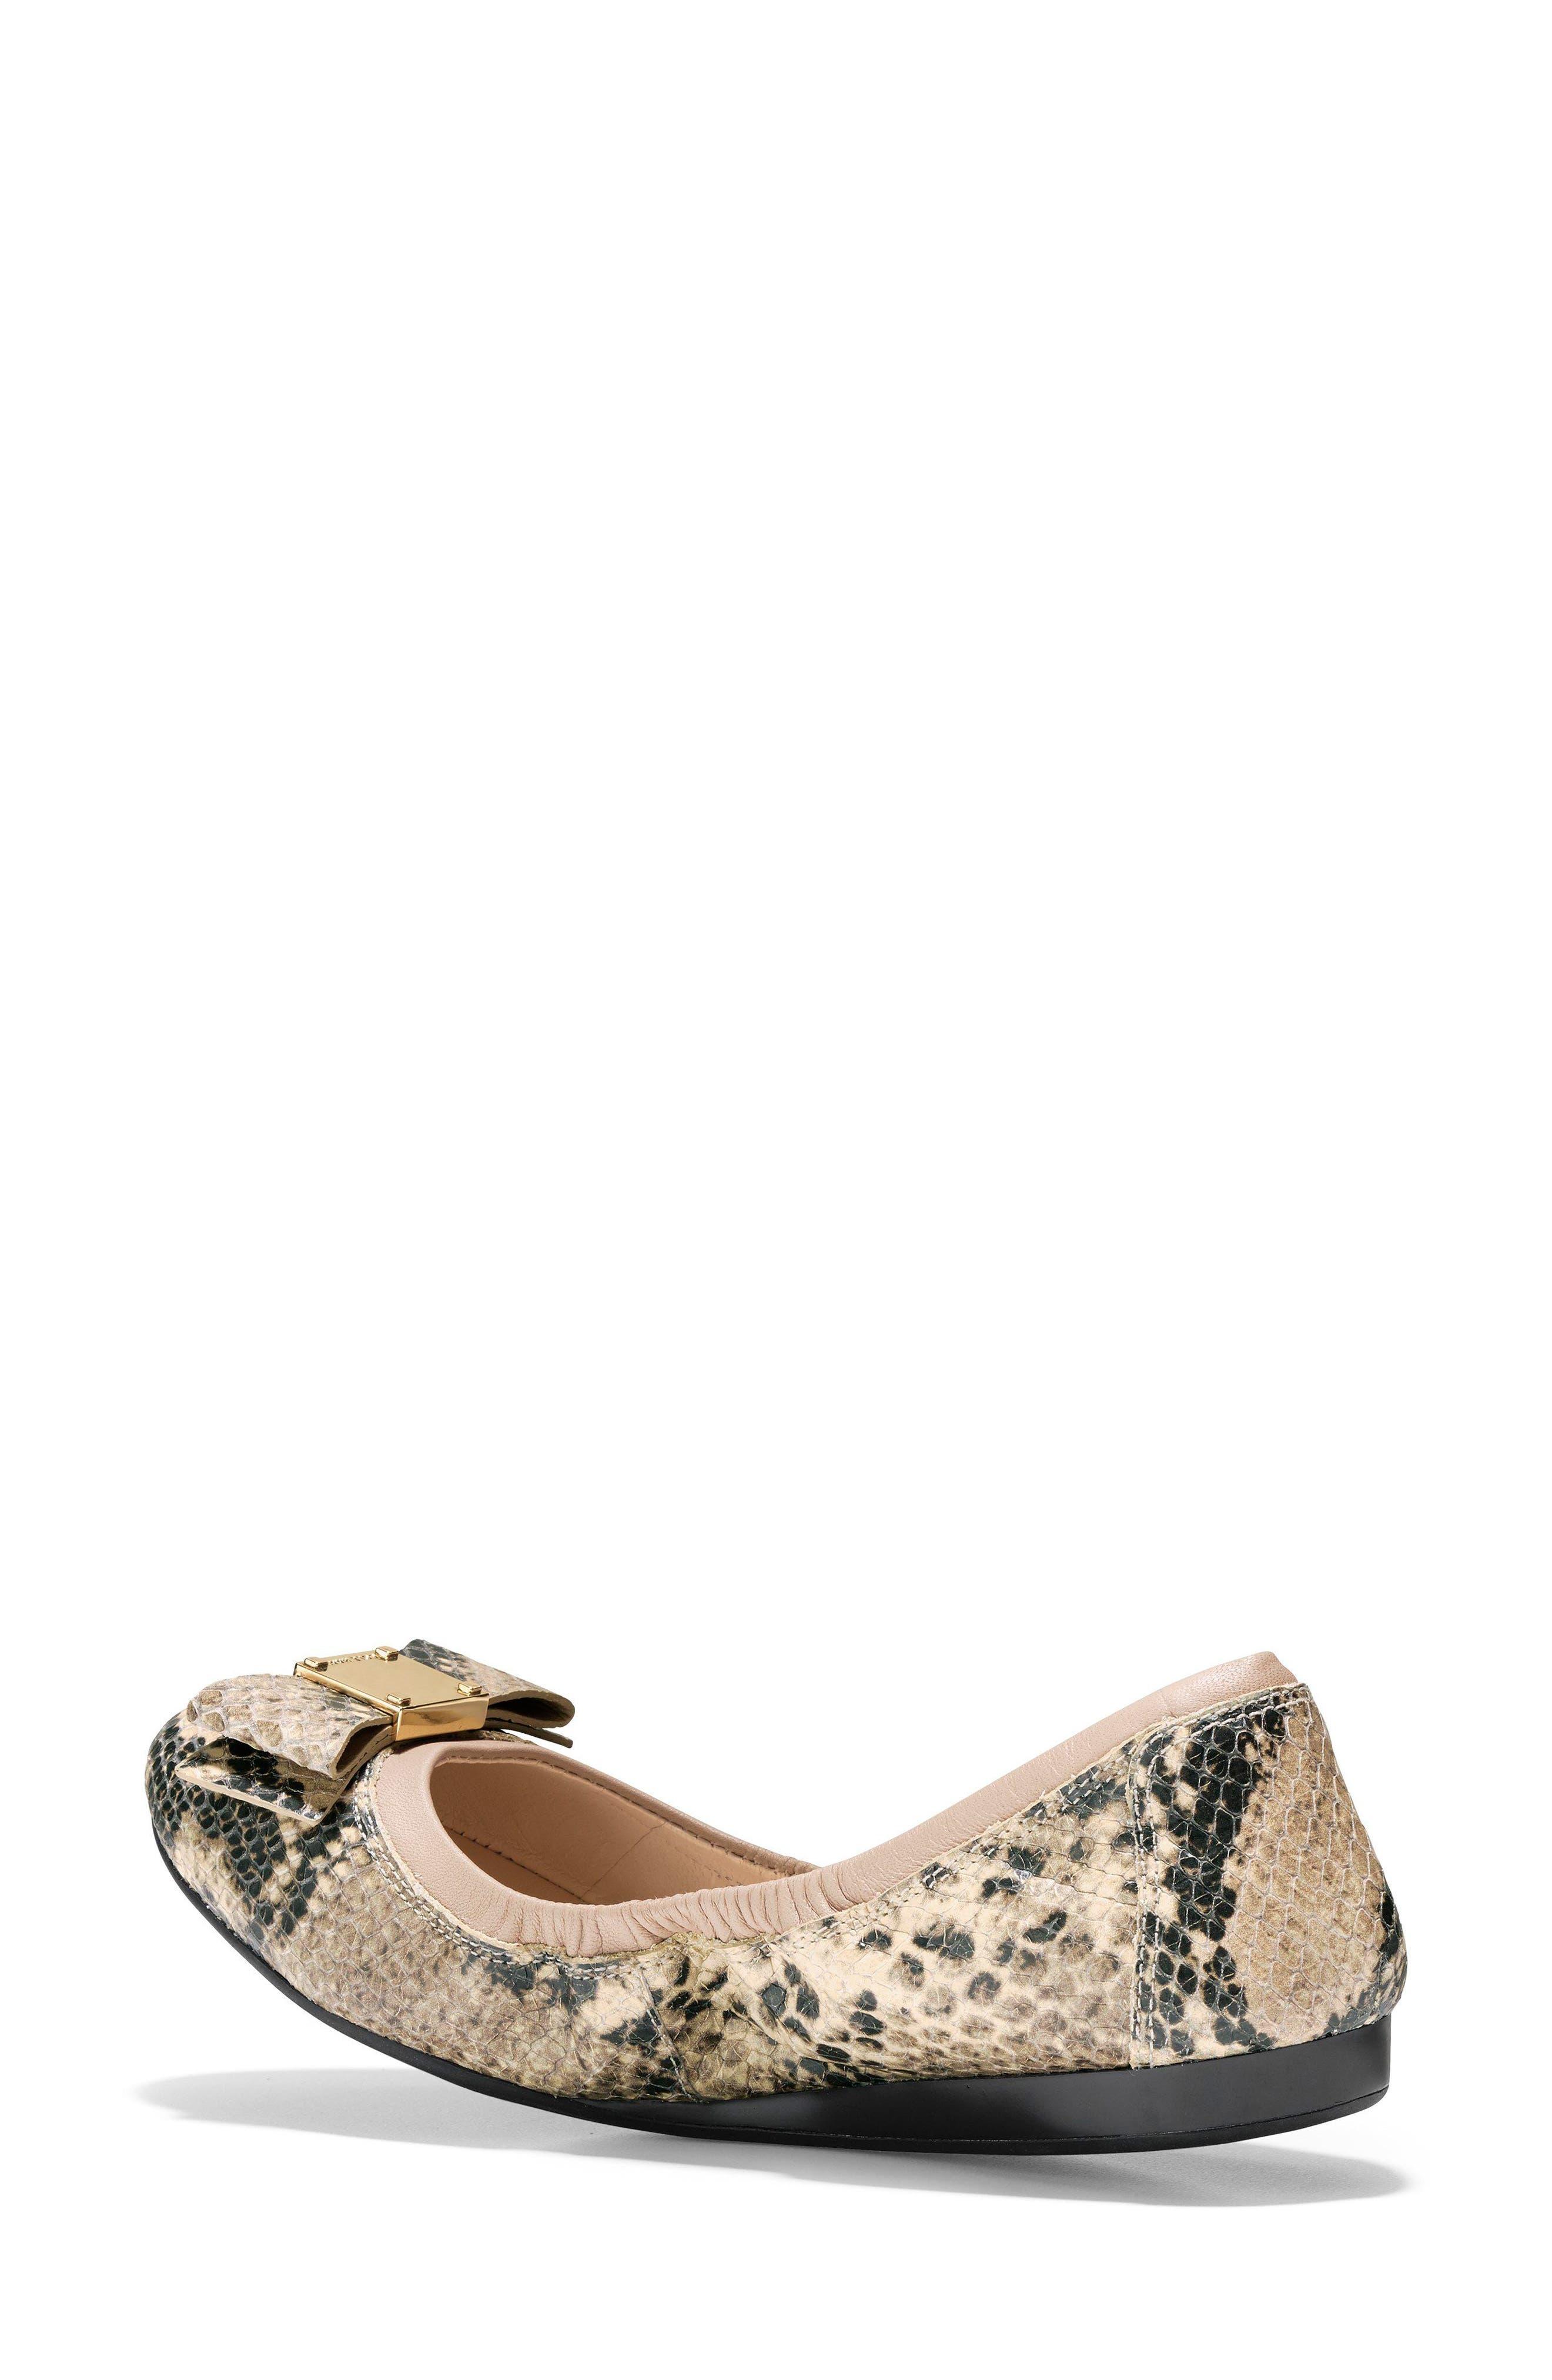 'Tali' Bow Ballet Flat,                             Alternate thumbnail 6, color,                             Roccia Snake Print Leather